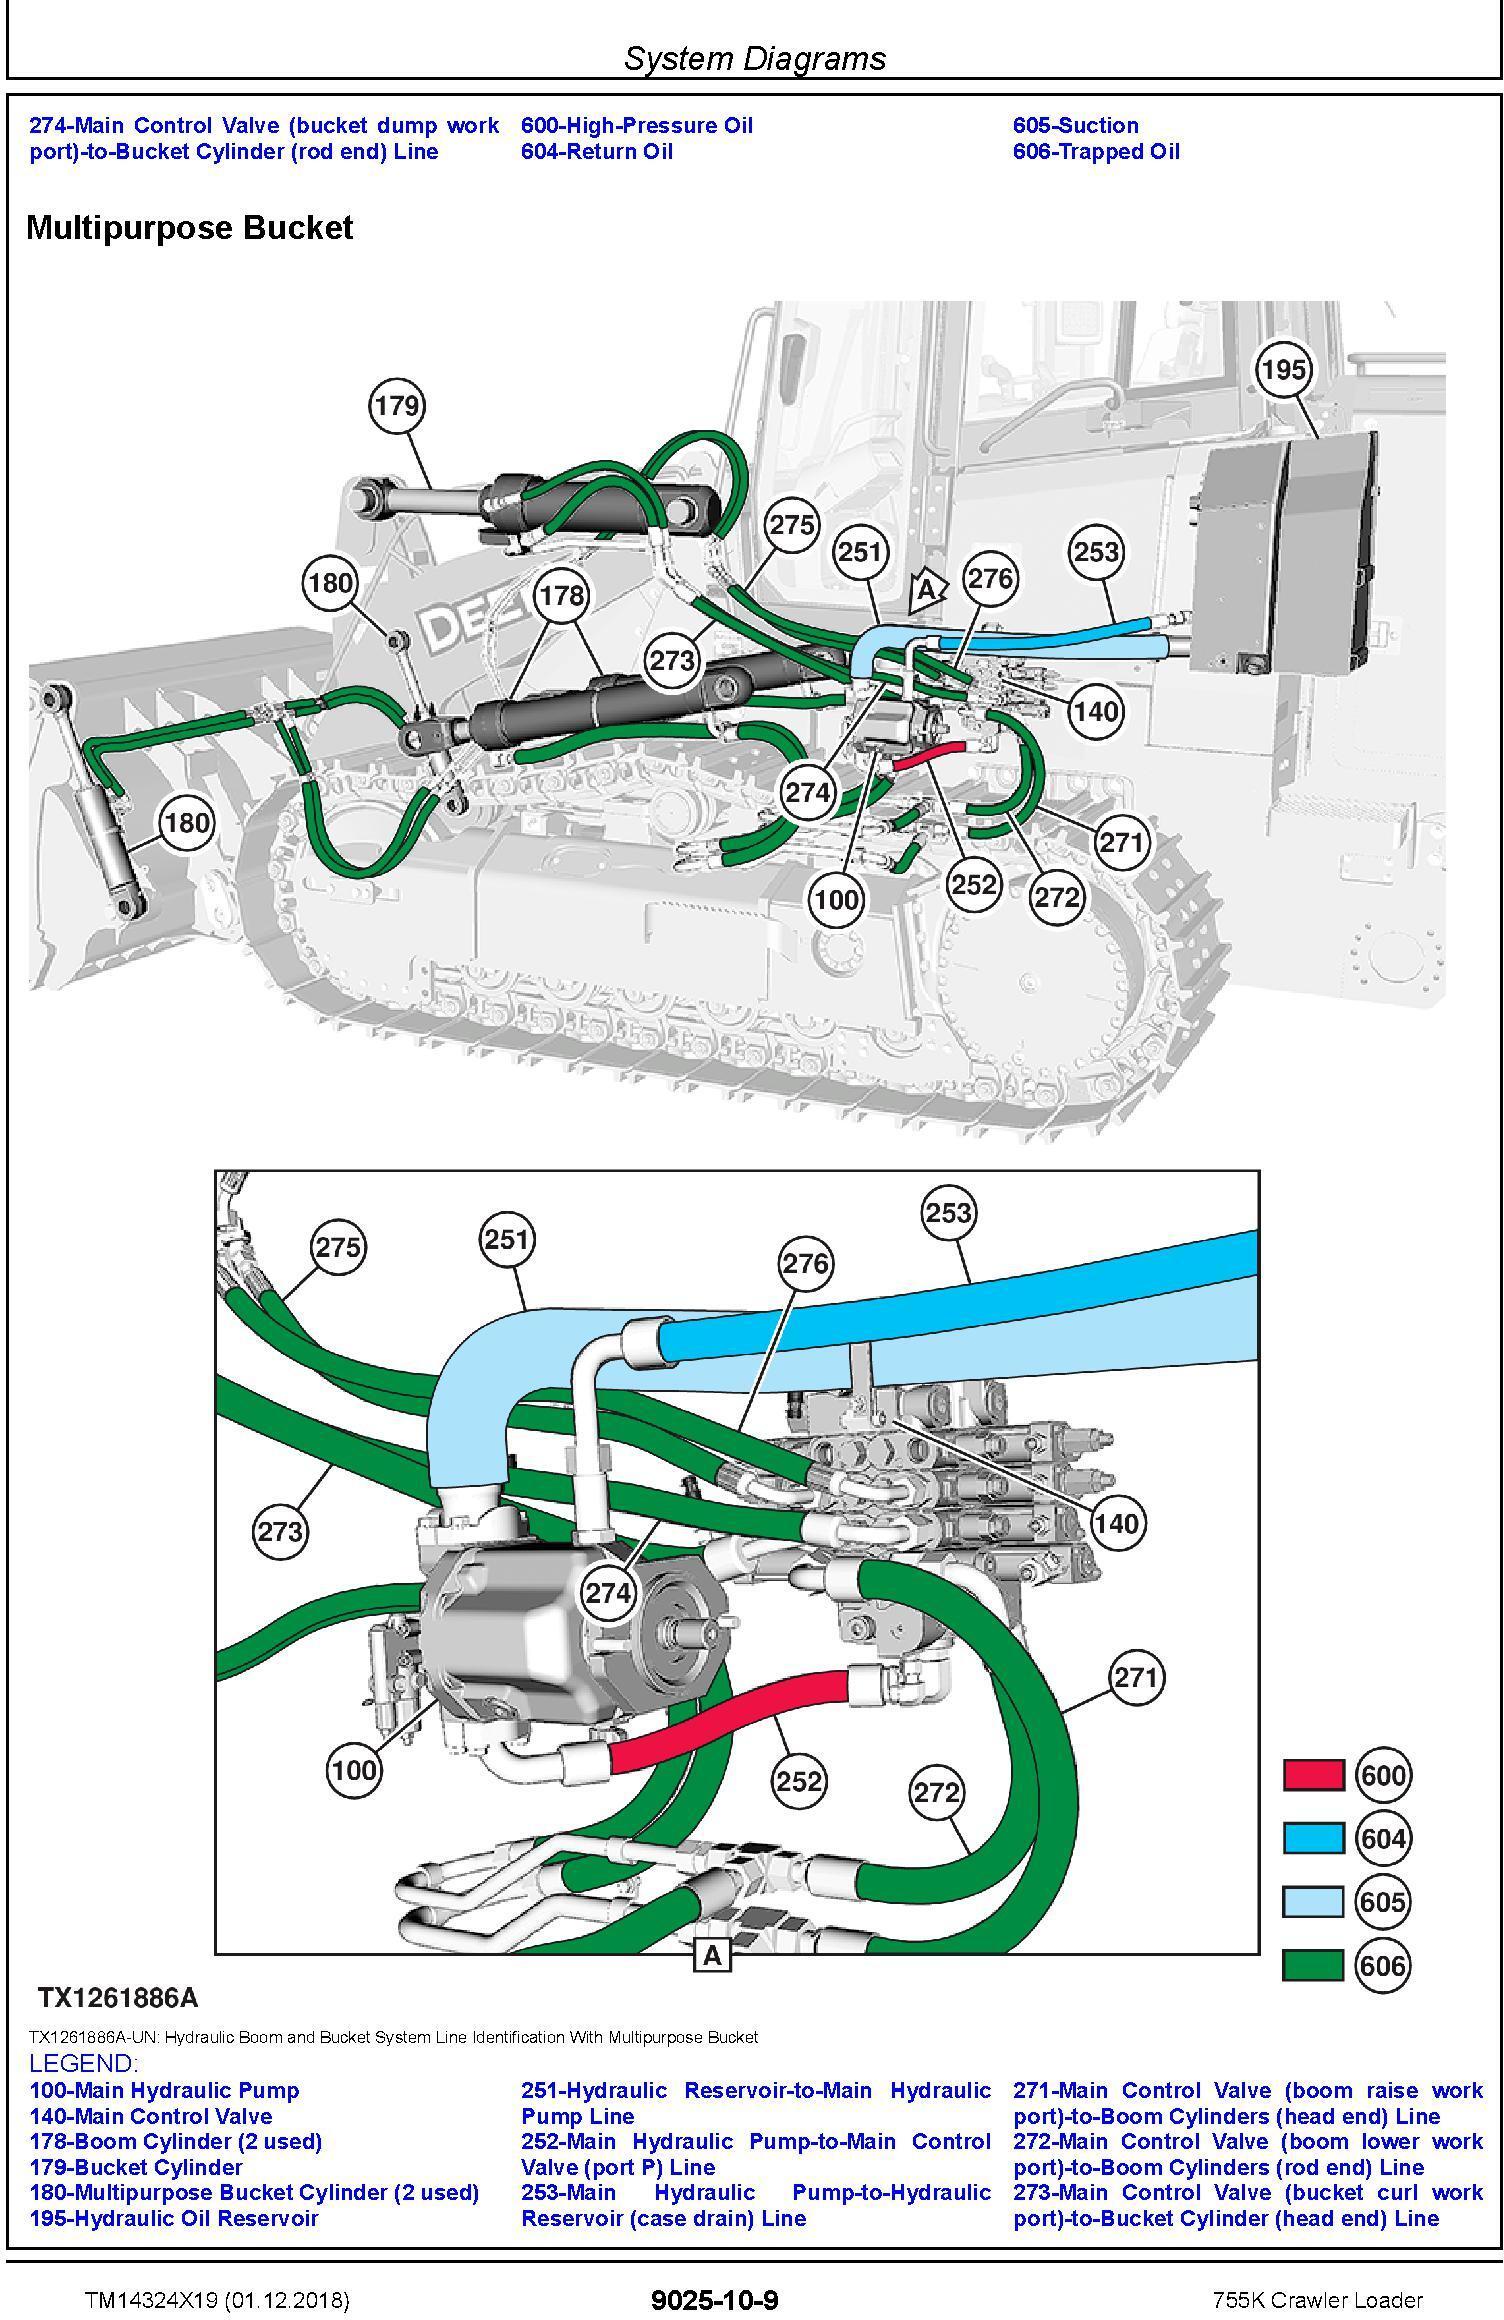 John Deere 755K Crawler Loader Operation & Test Technical Manual (TM14324X19) - 3